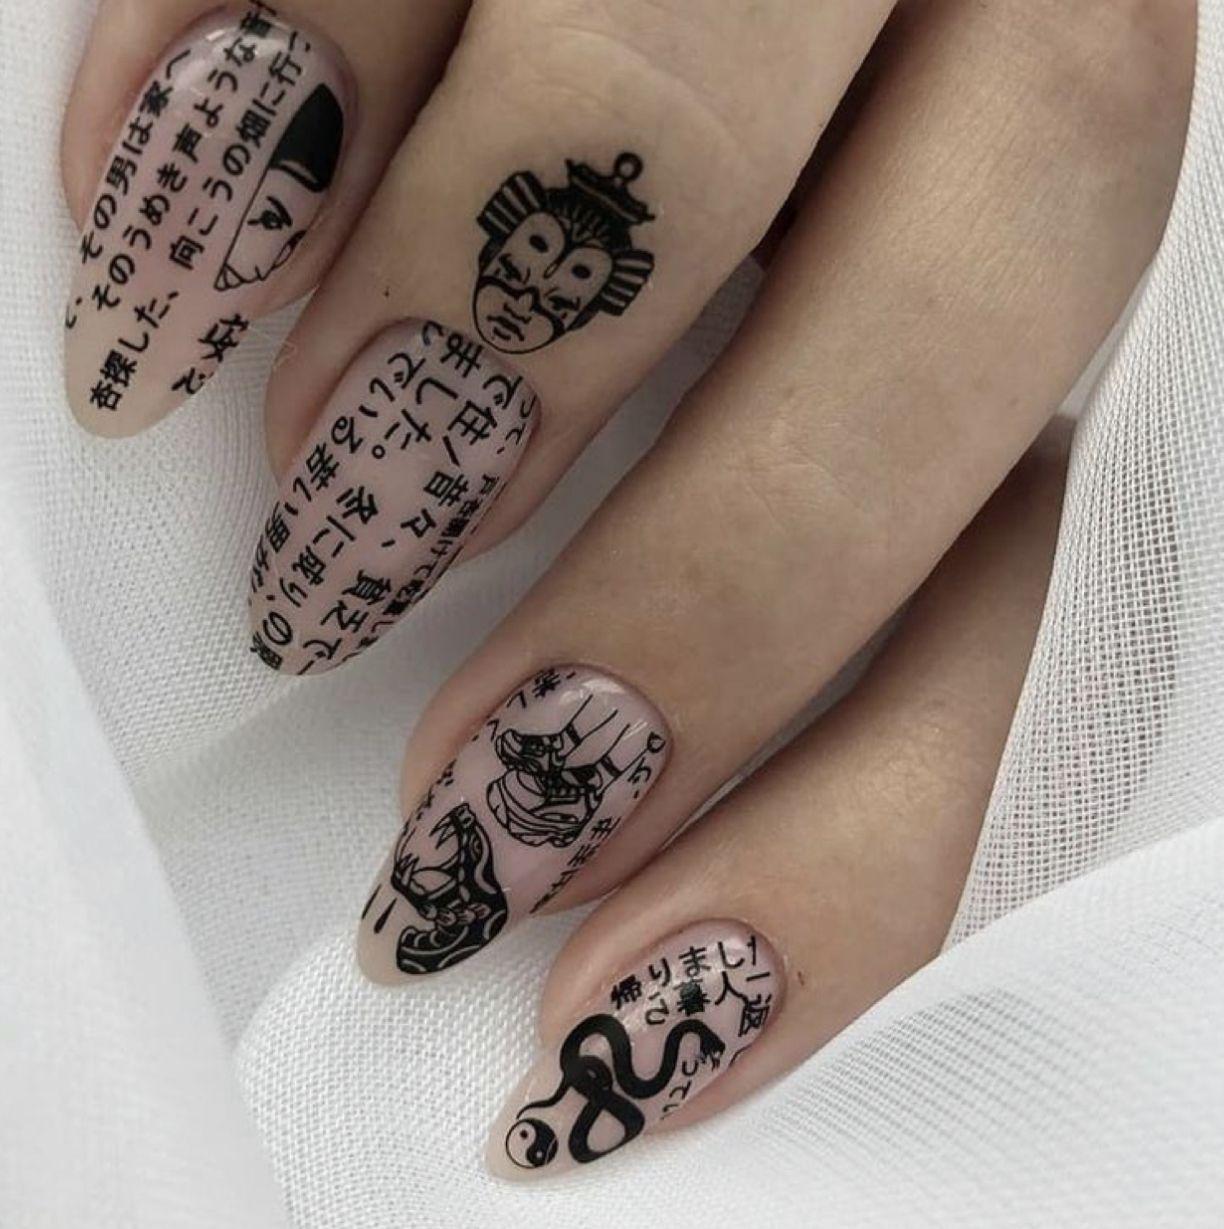 Nails Nailart Art Japanese Hiragana Tumblr Aesthetic Edgy Lovely Cute Bts Adore Inspo V 2020 G Gelevye Nogti Dizajnerskie Nogti Nogti